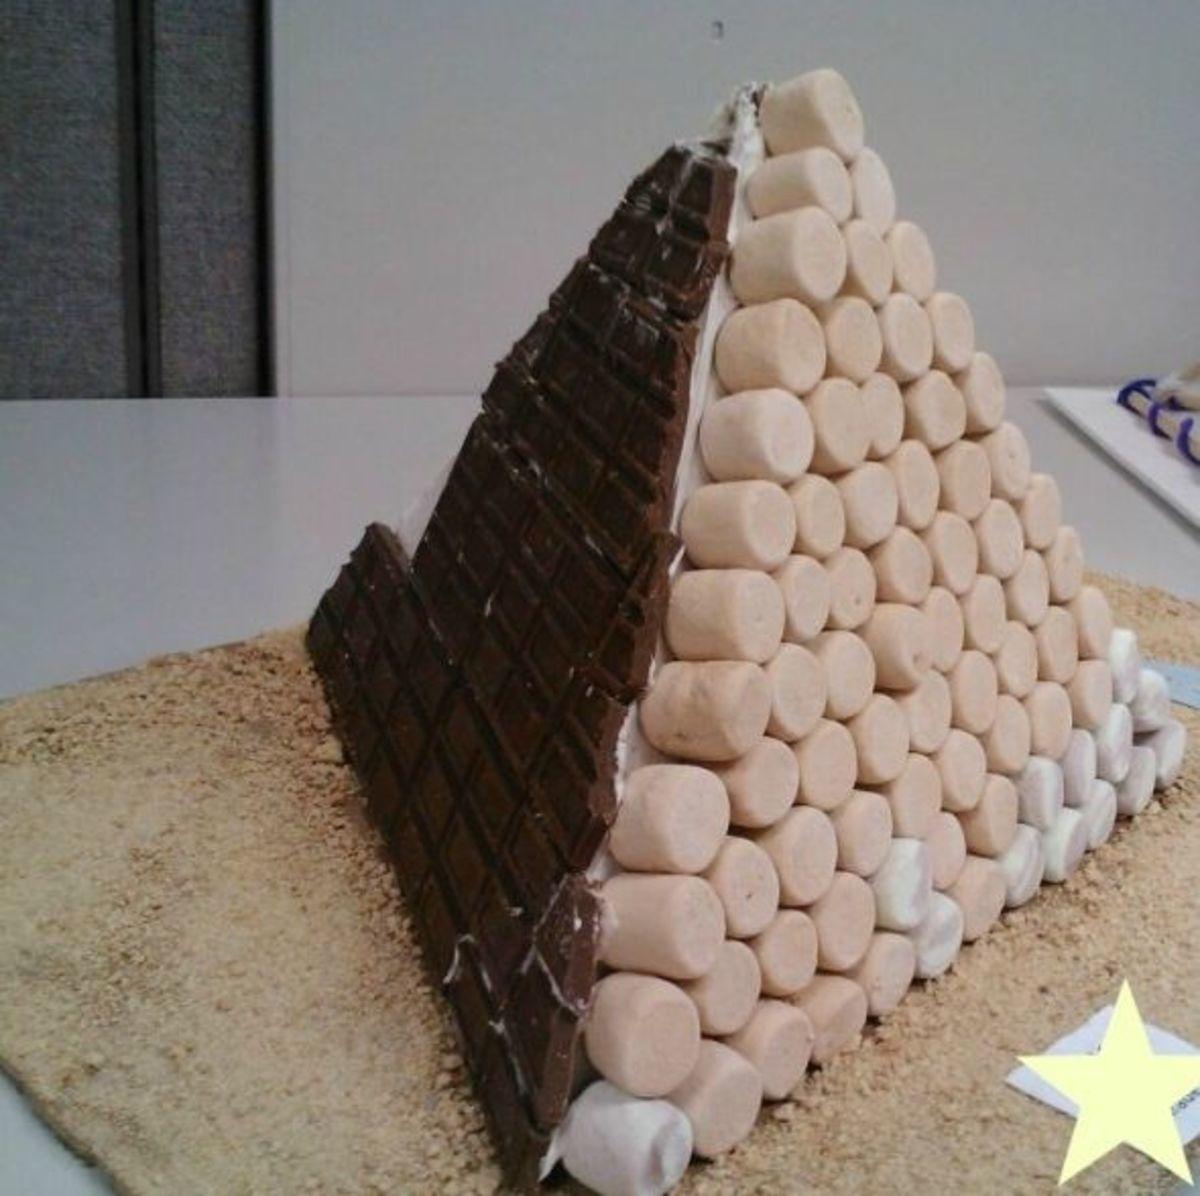 Creative 3d Pyramid